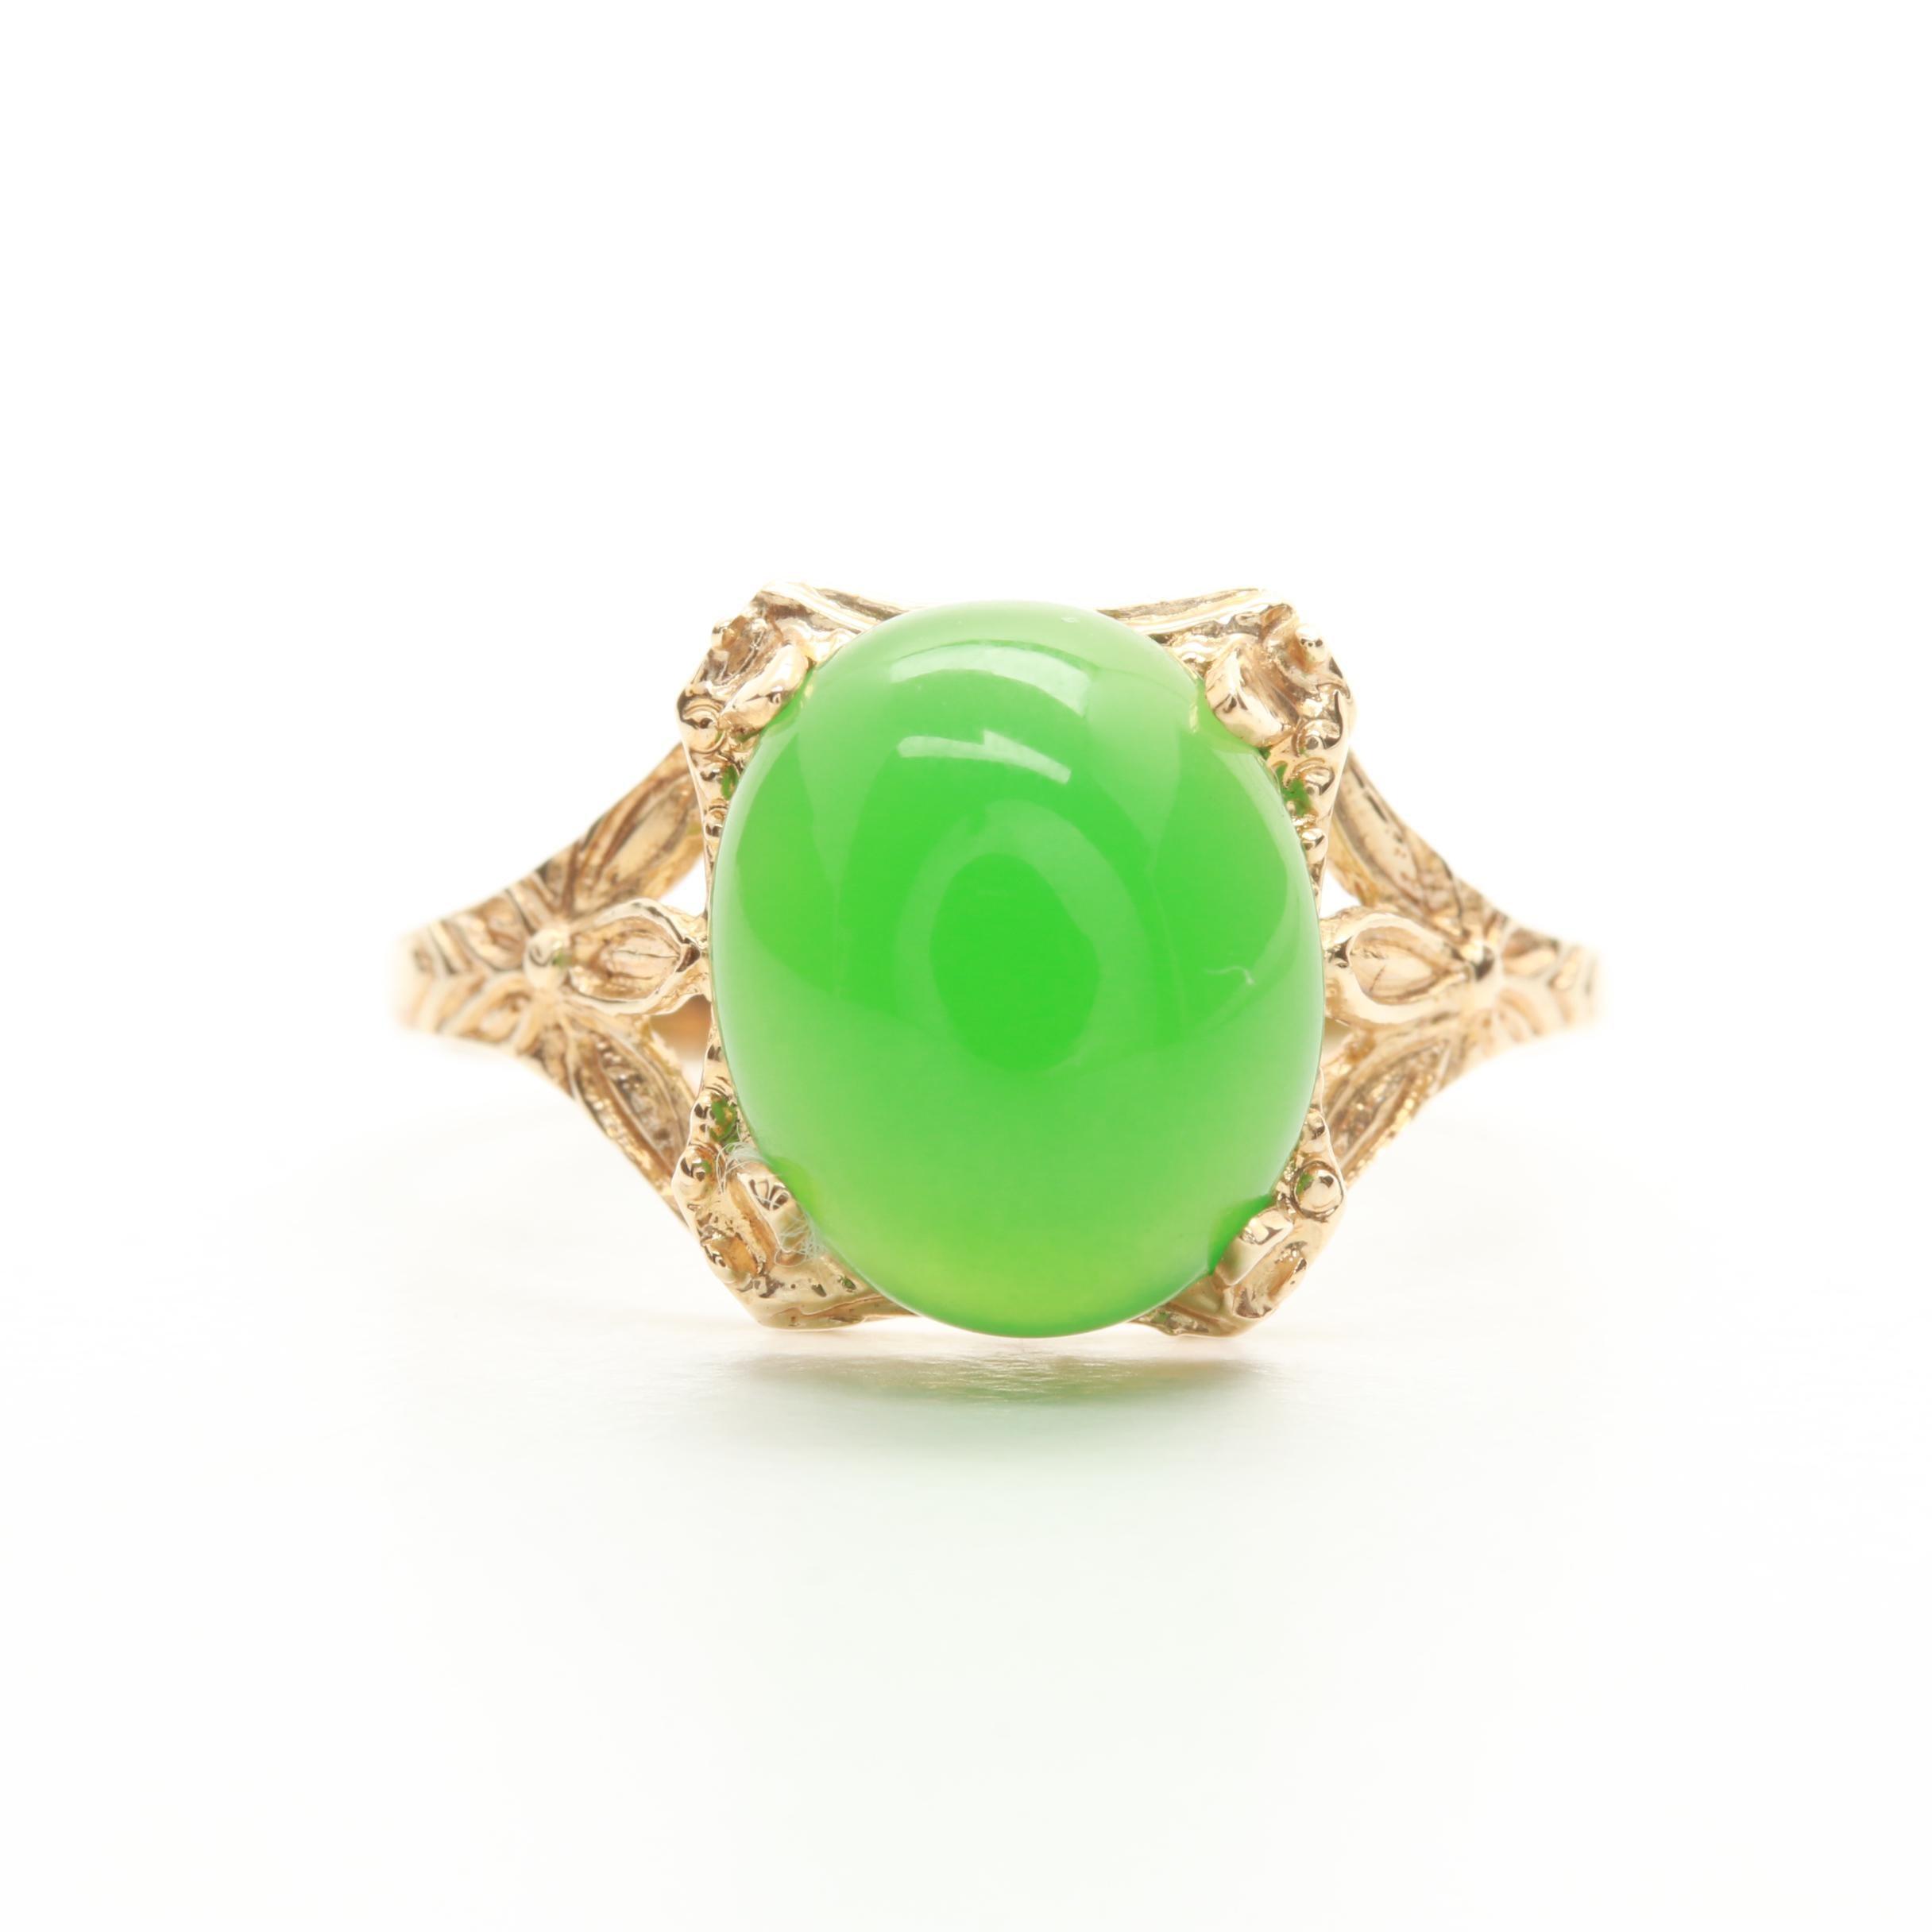 10K Yellow Gold Green Chalcedony Ring